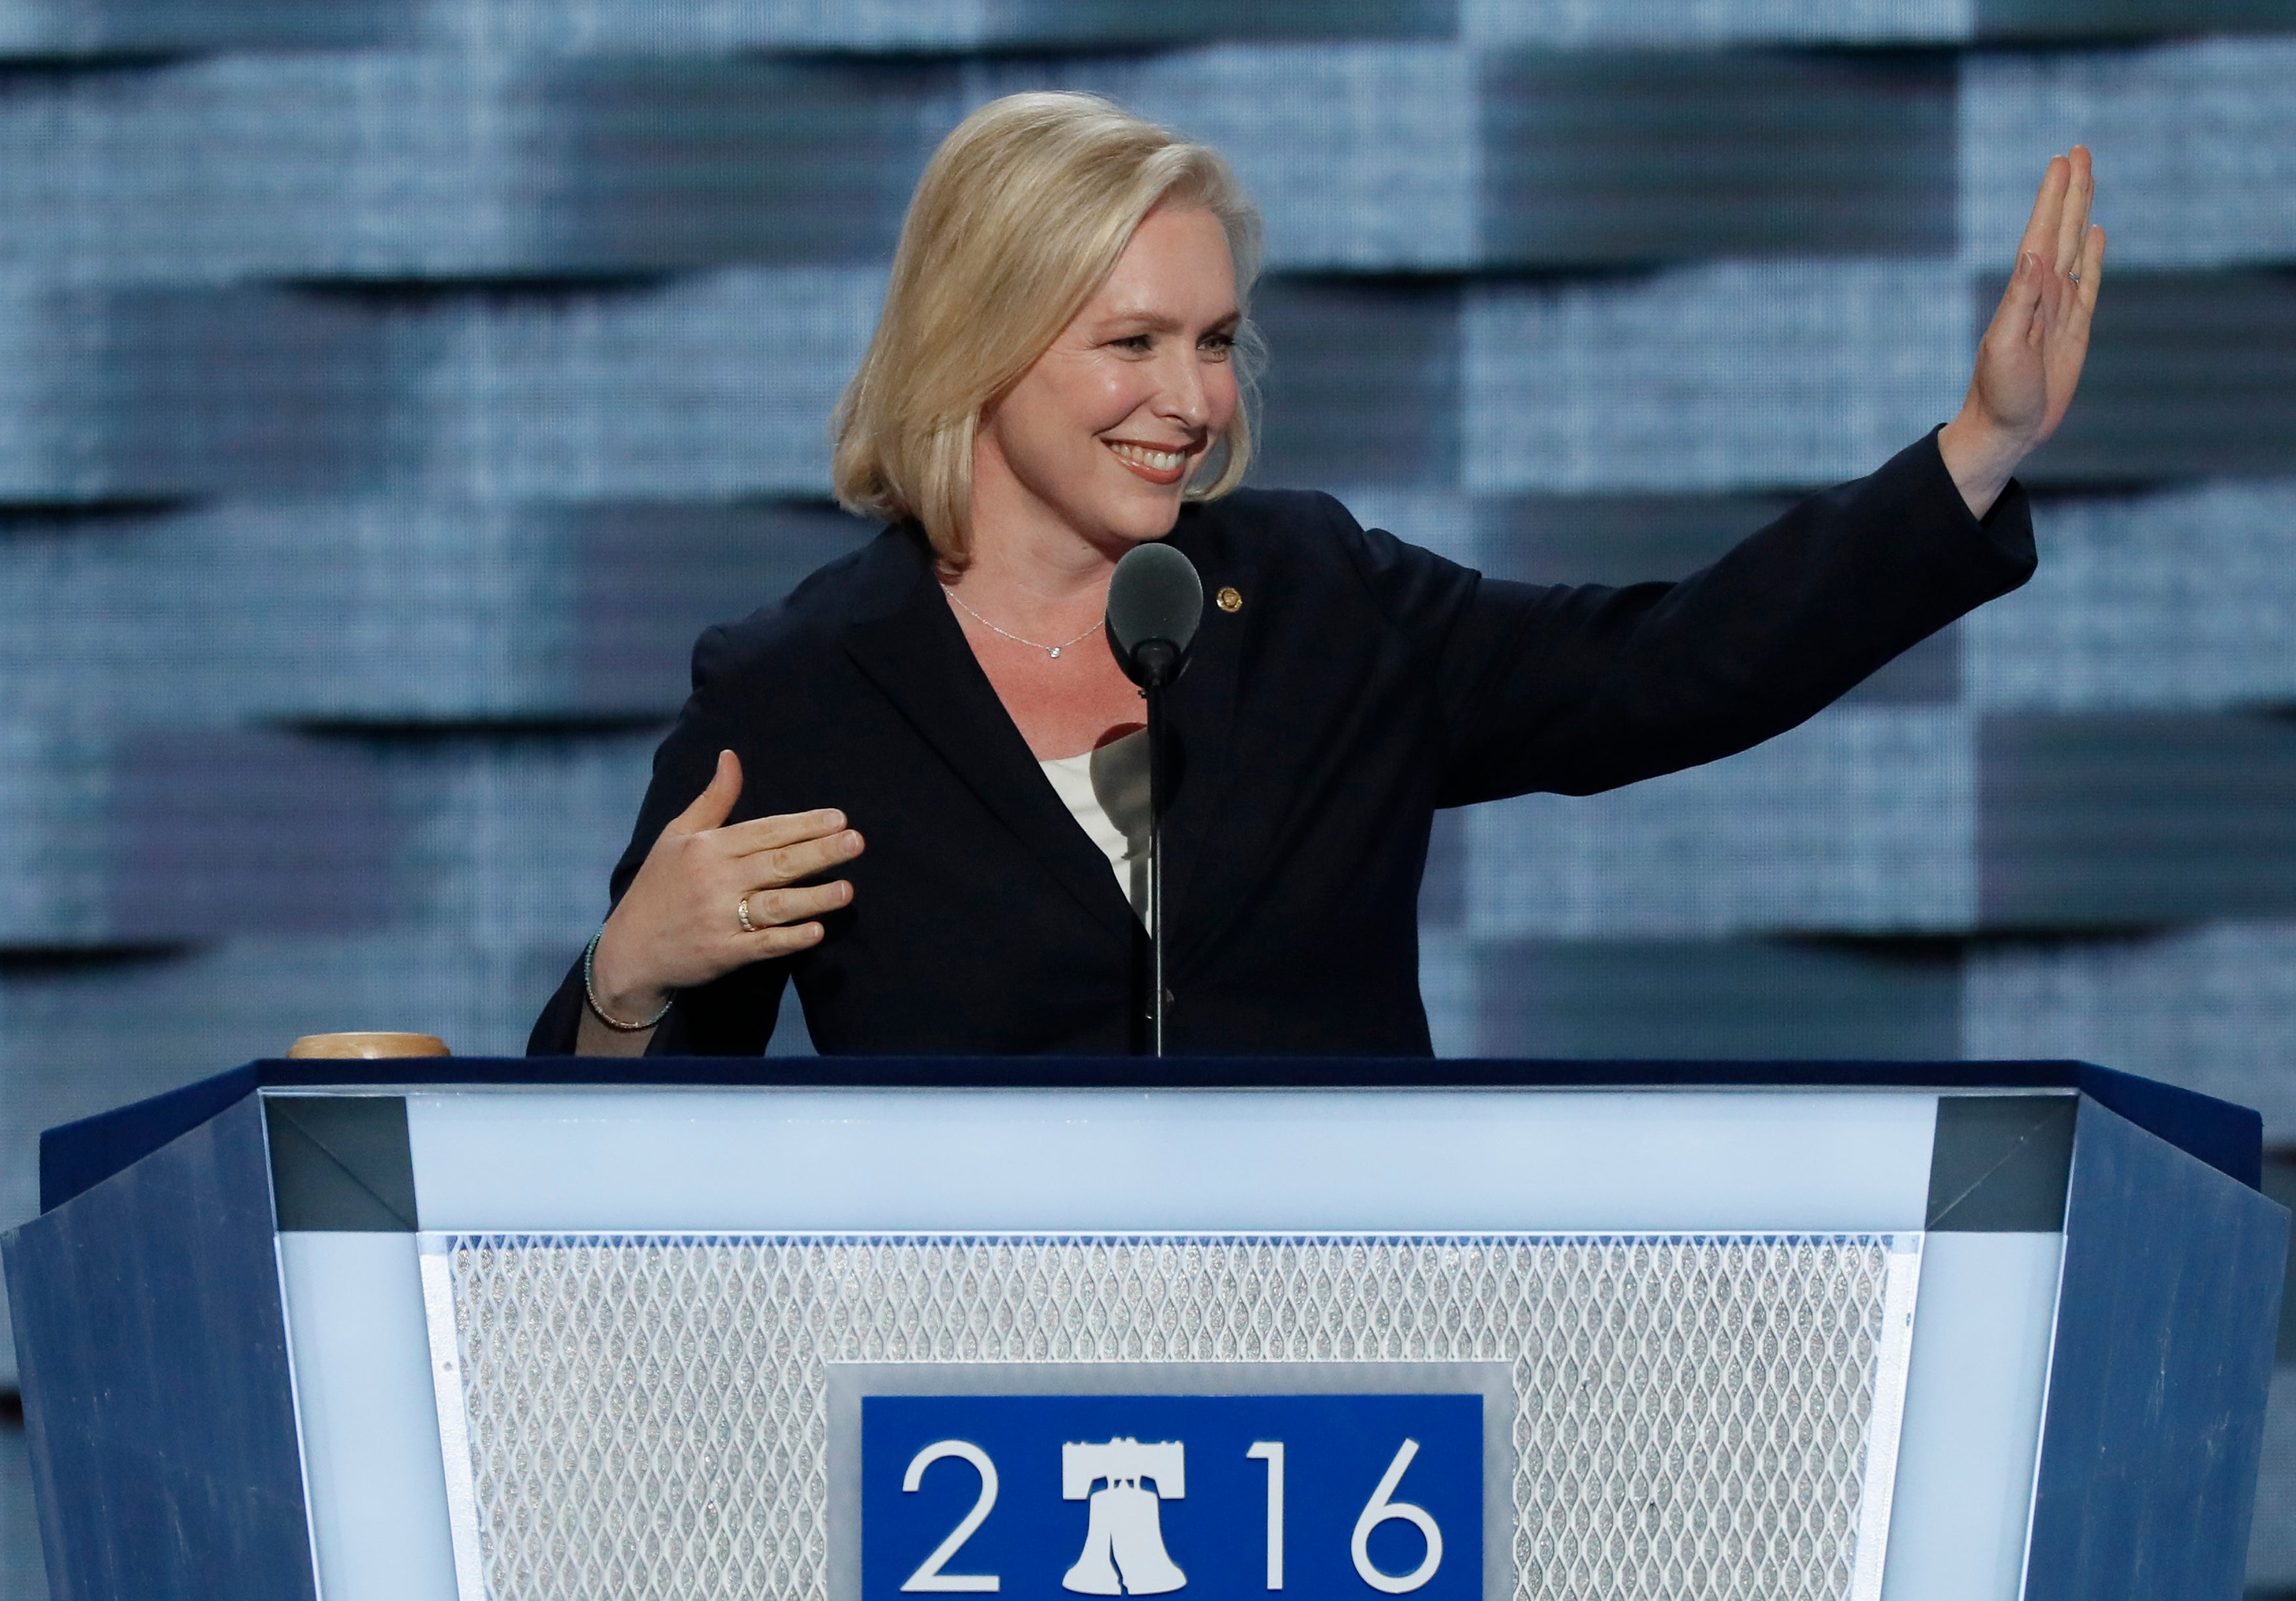 New York Sen. Kirsten Gillibrand at the Democratic National Convention in Philadelphia.